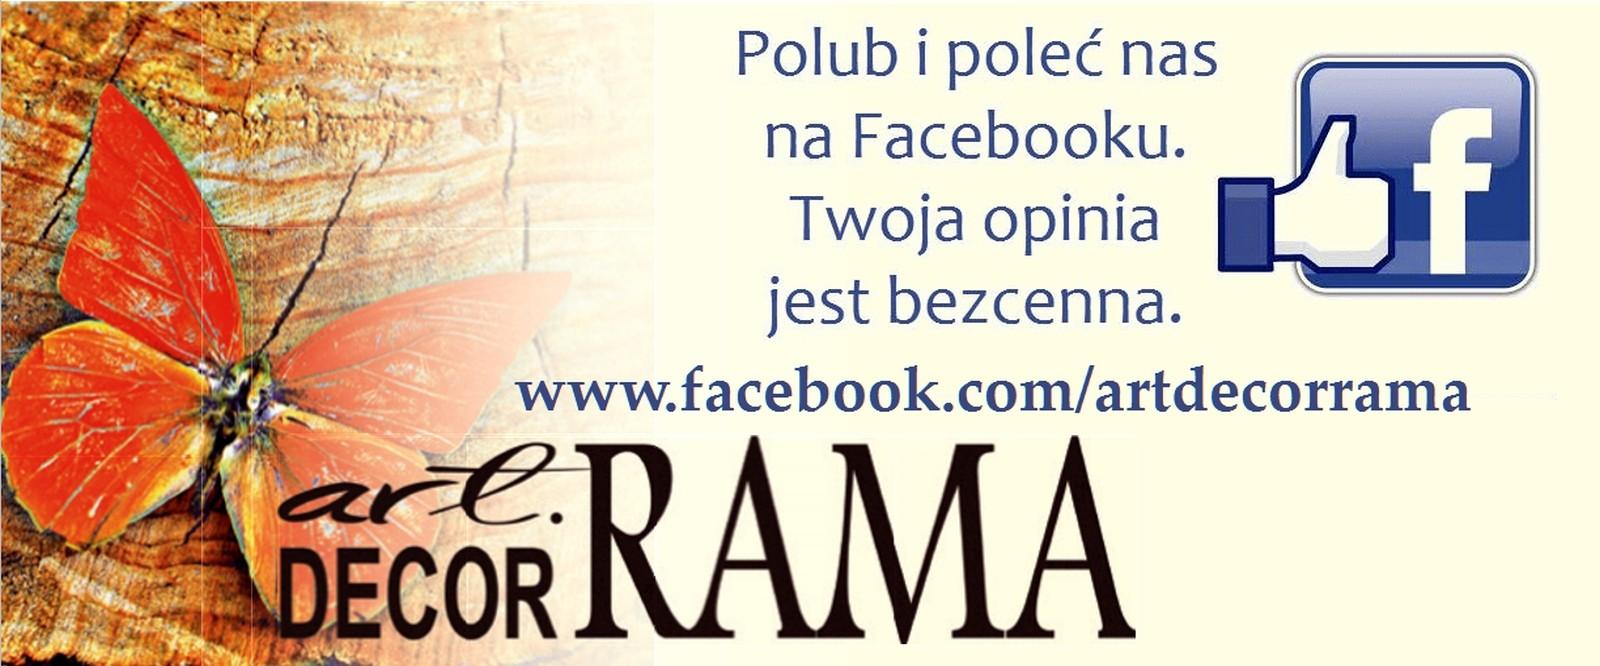 artdecorrama-facebook